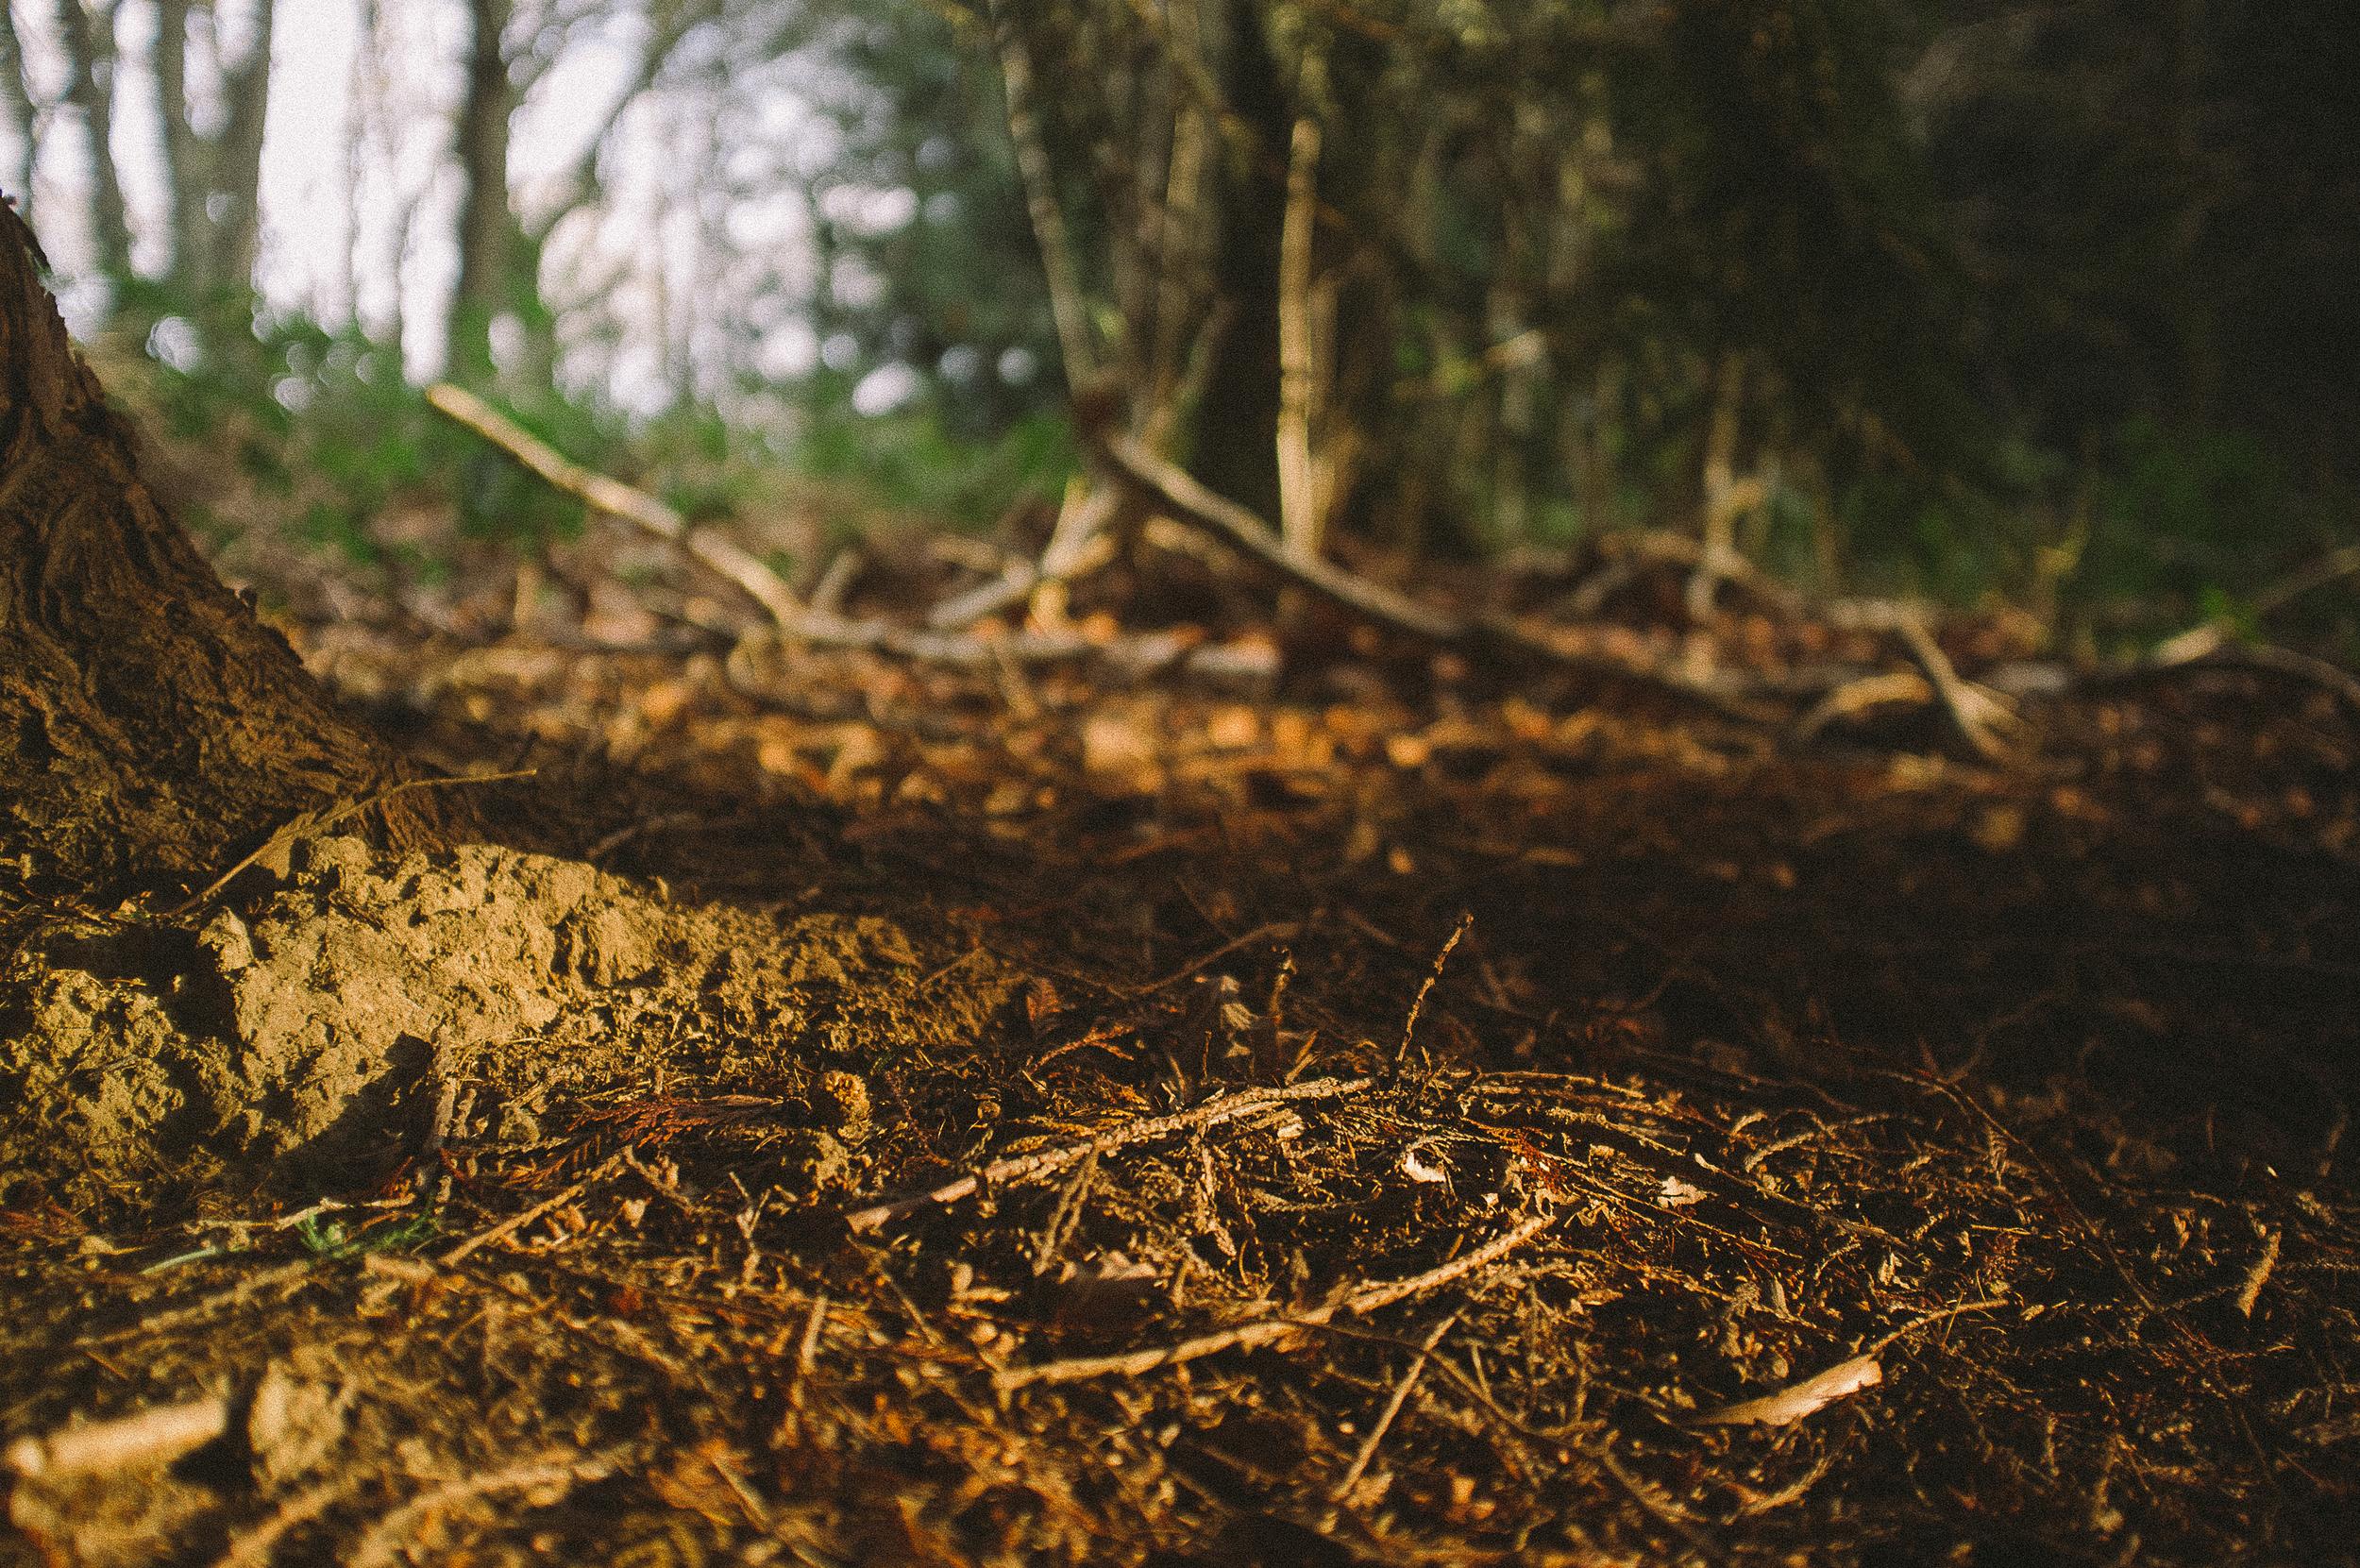 fuji x100 woods-1-10.jpg